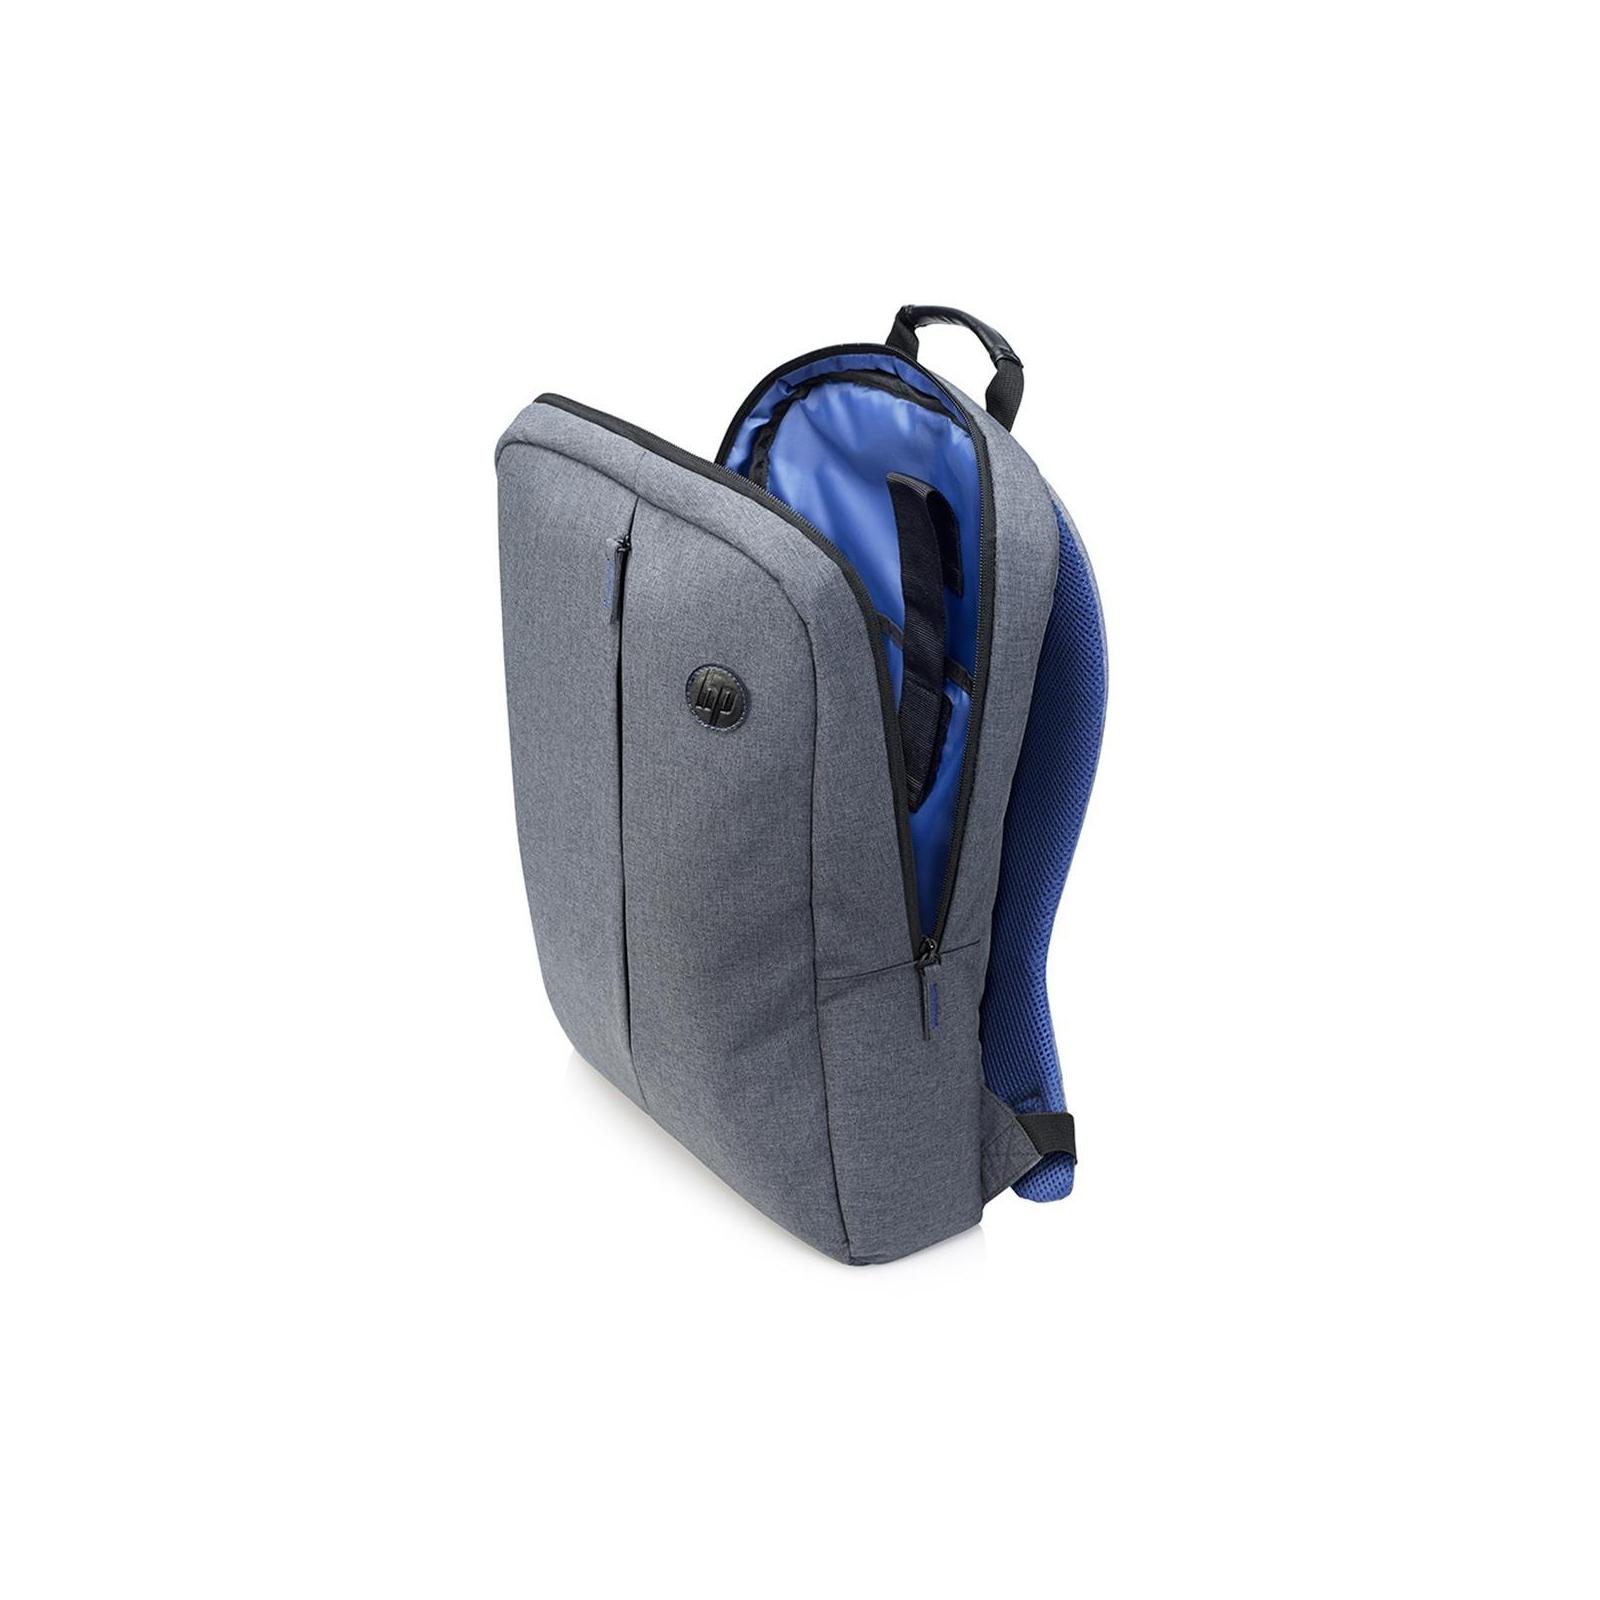 "Рюкзак для ноутбука HP 15.6"" Value Grey (K0B39AA) изображение 5"